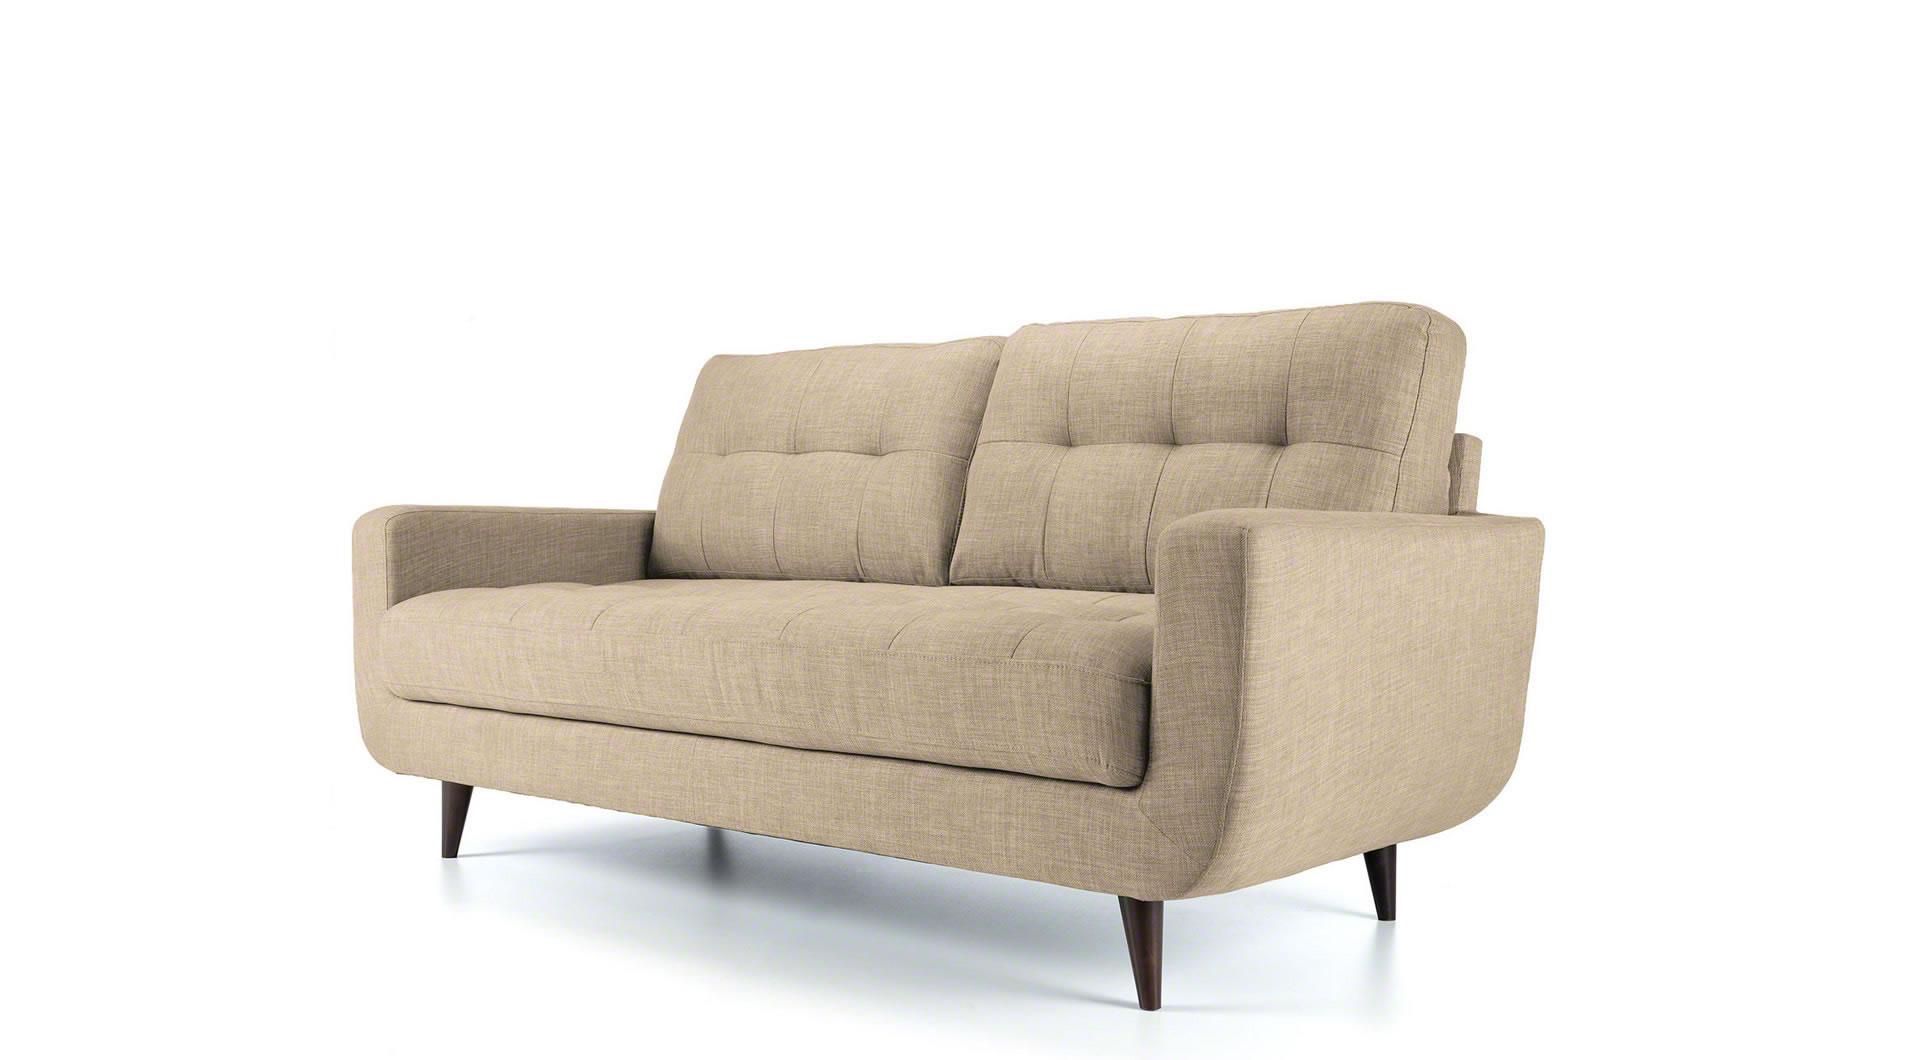 oatmeal sofa pit chloe 3 seater mysmallspace